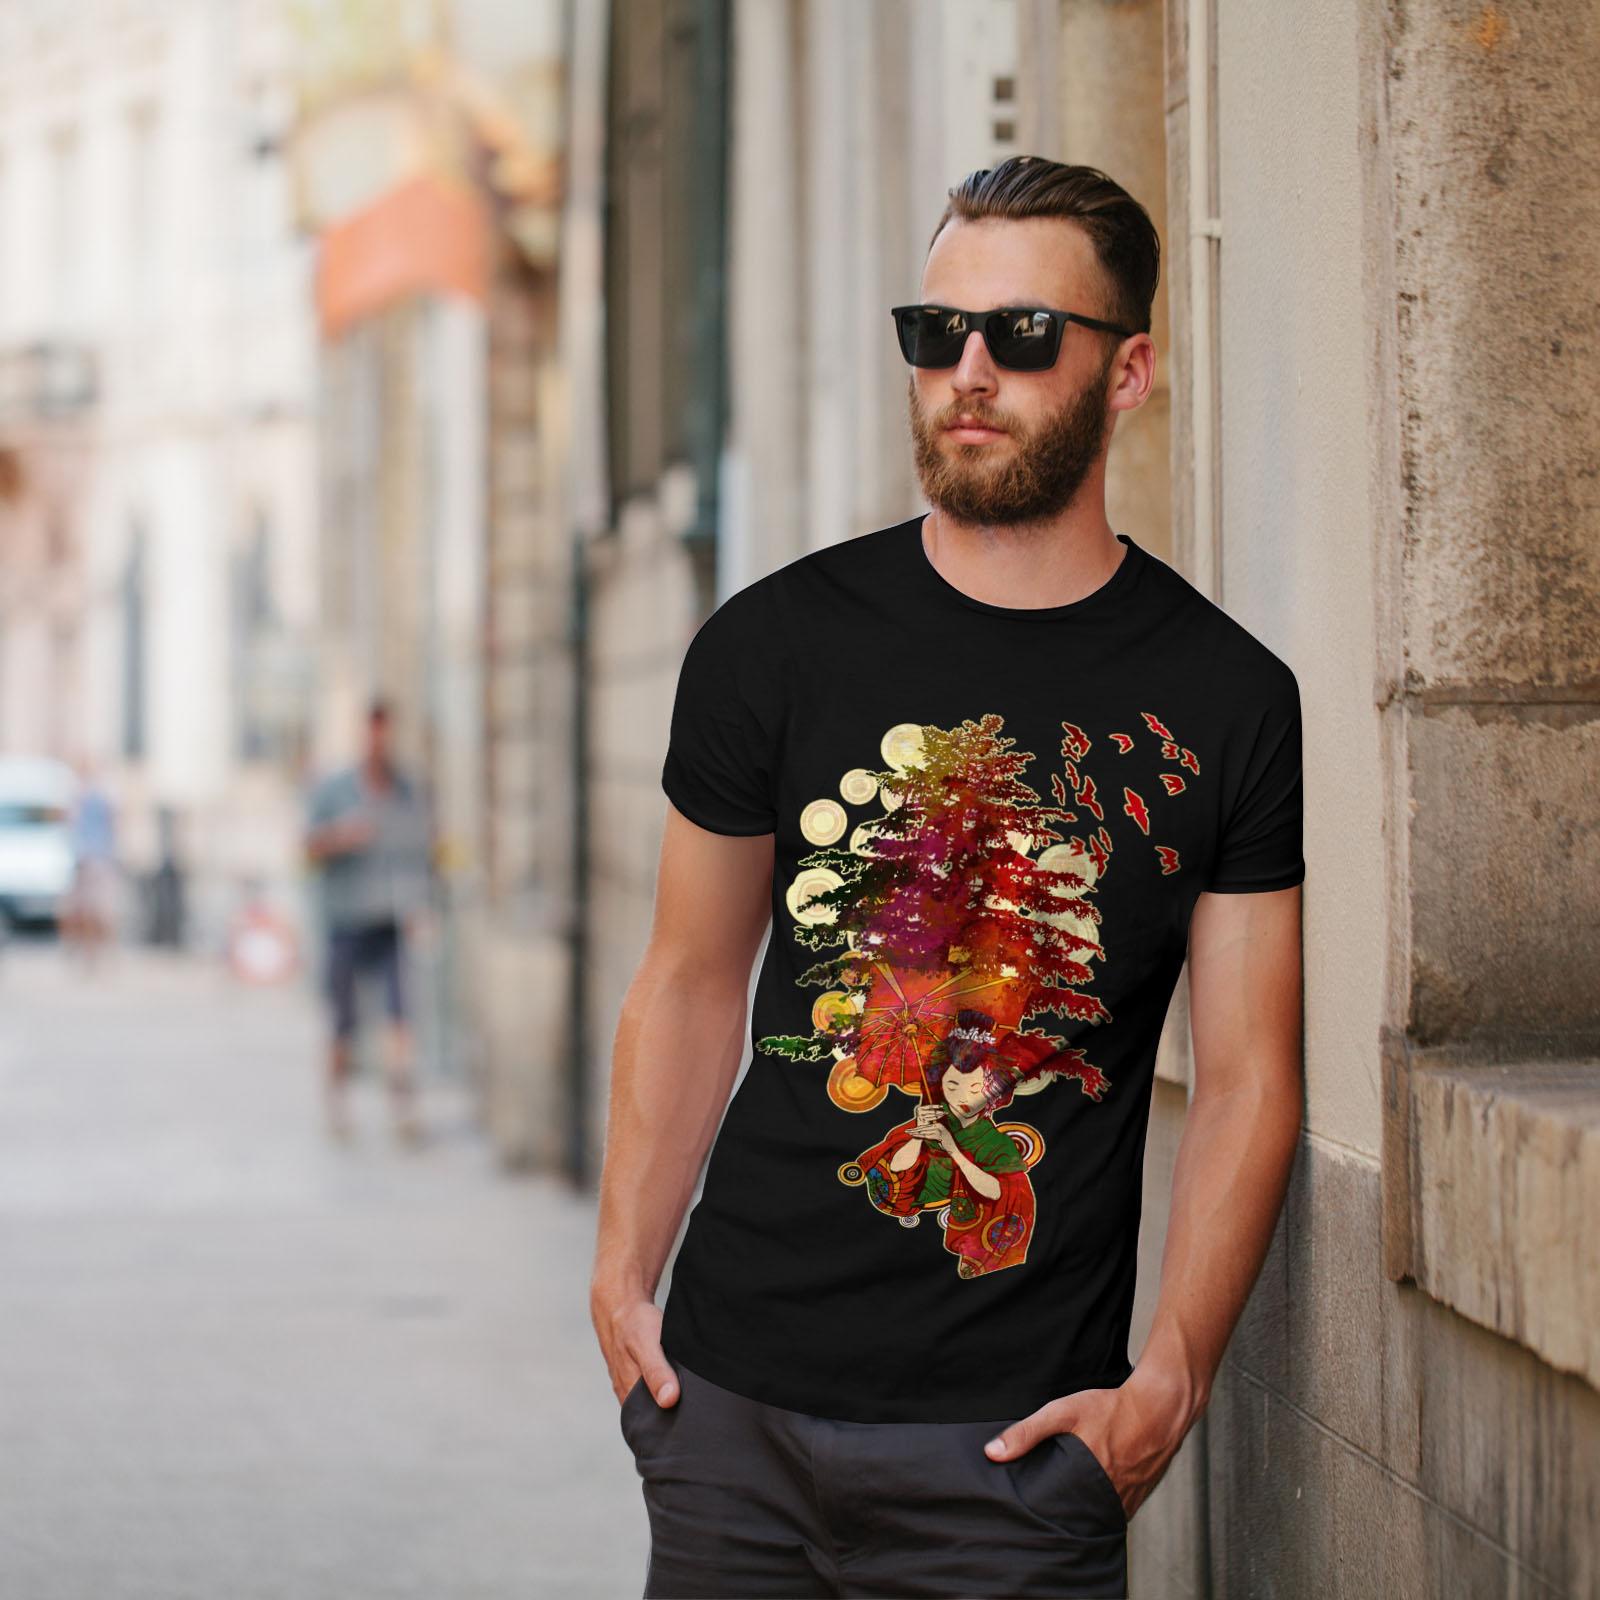 Wellcoda Tokyo City Map Fashion Mens T-shirt Asia Graphic Design Printed Tee